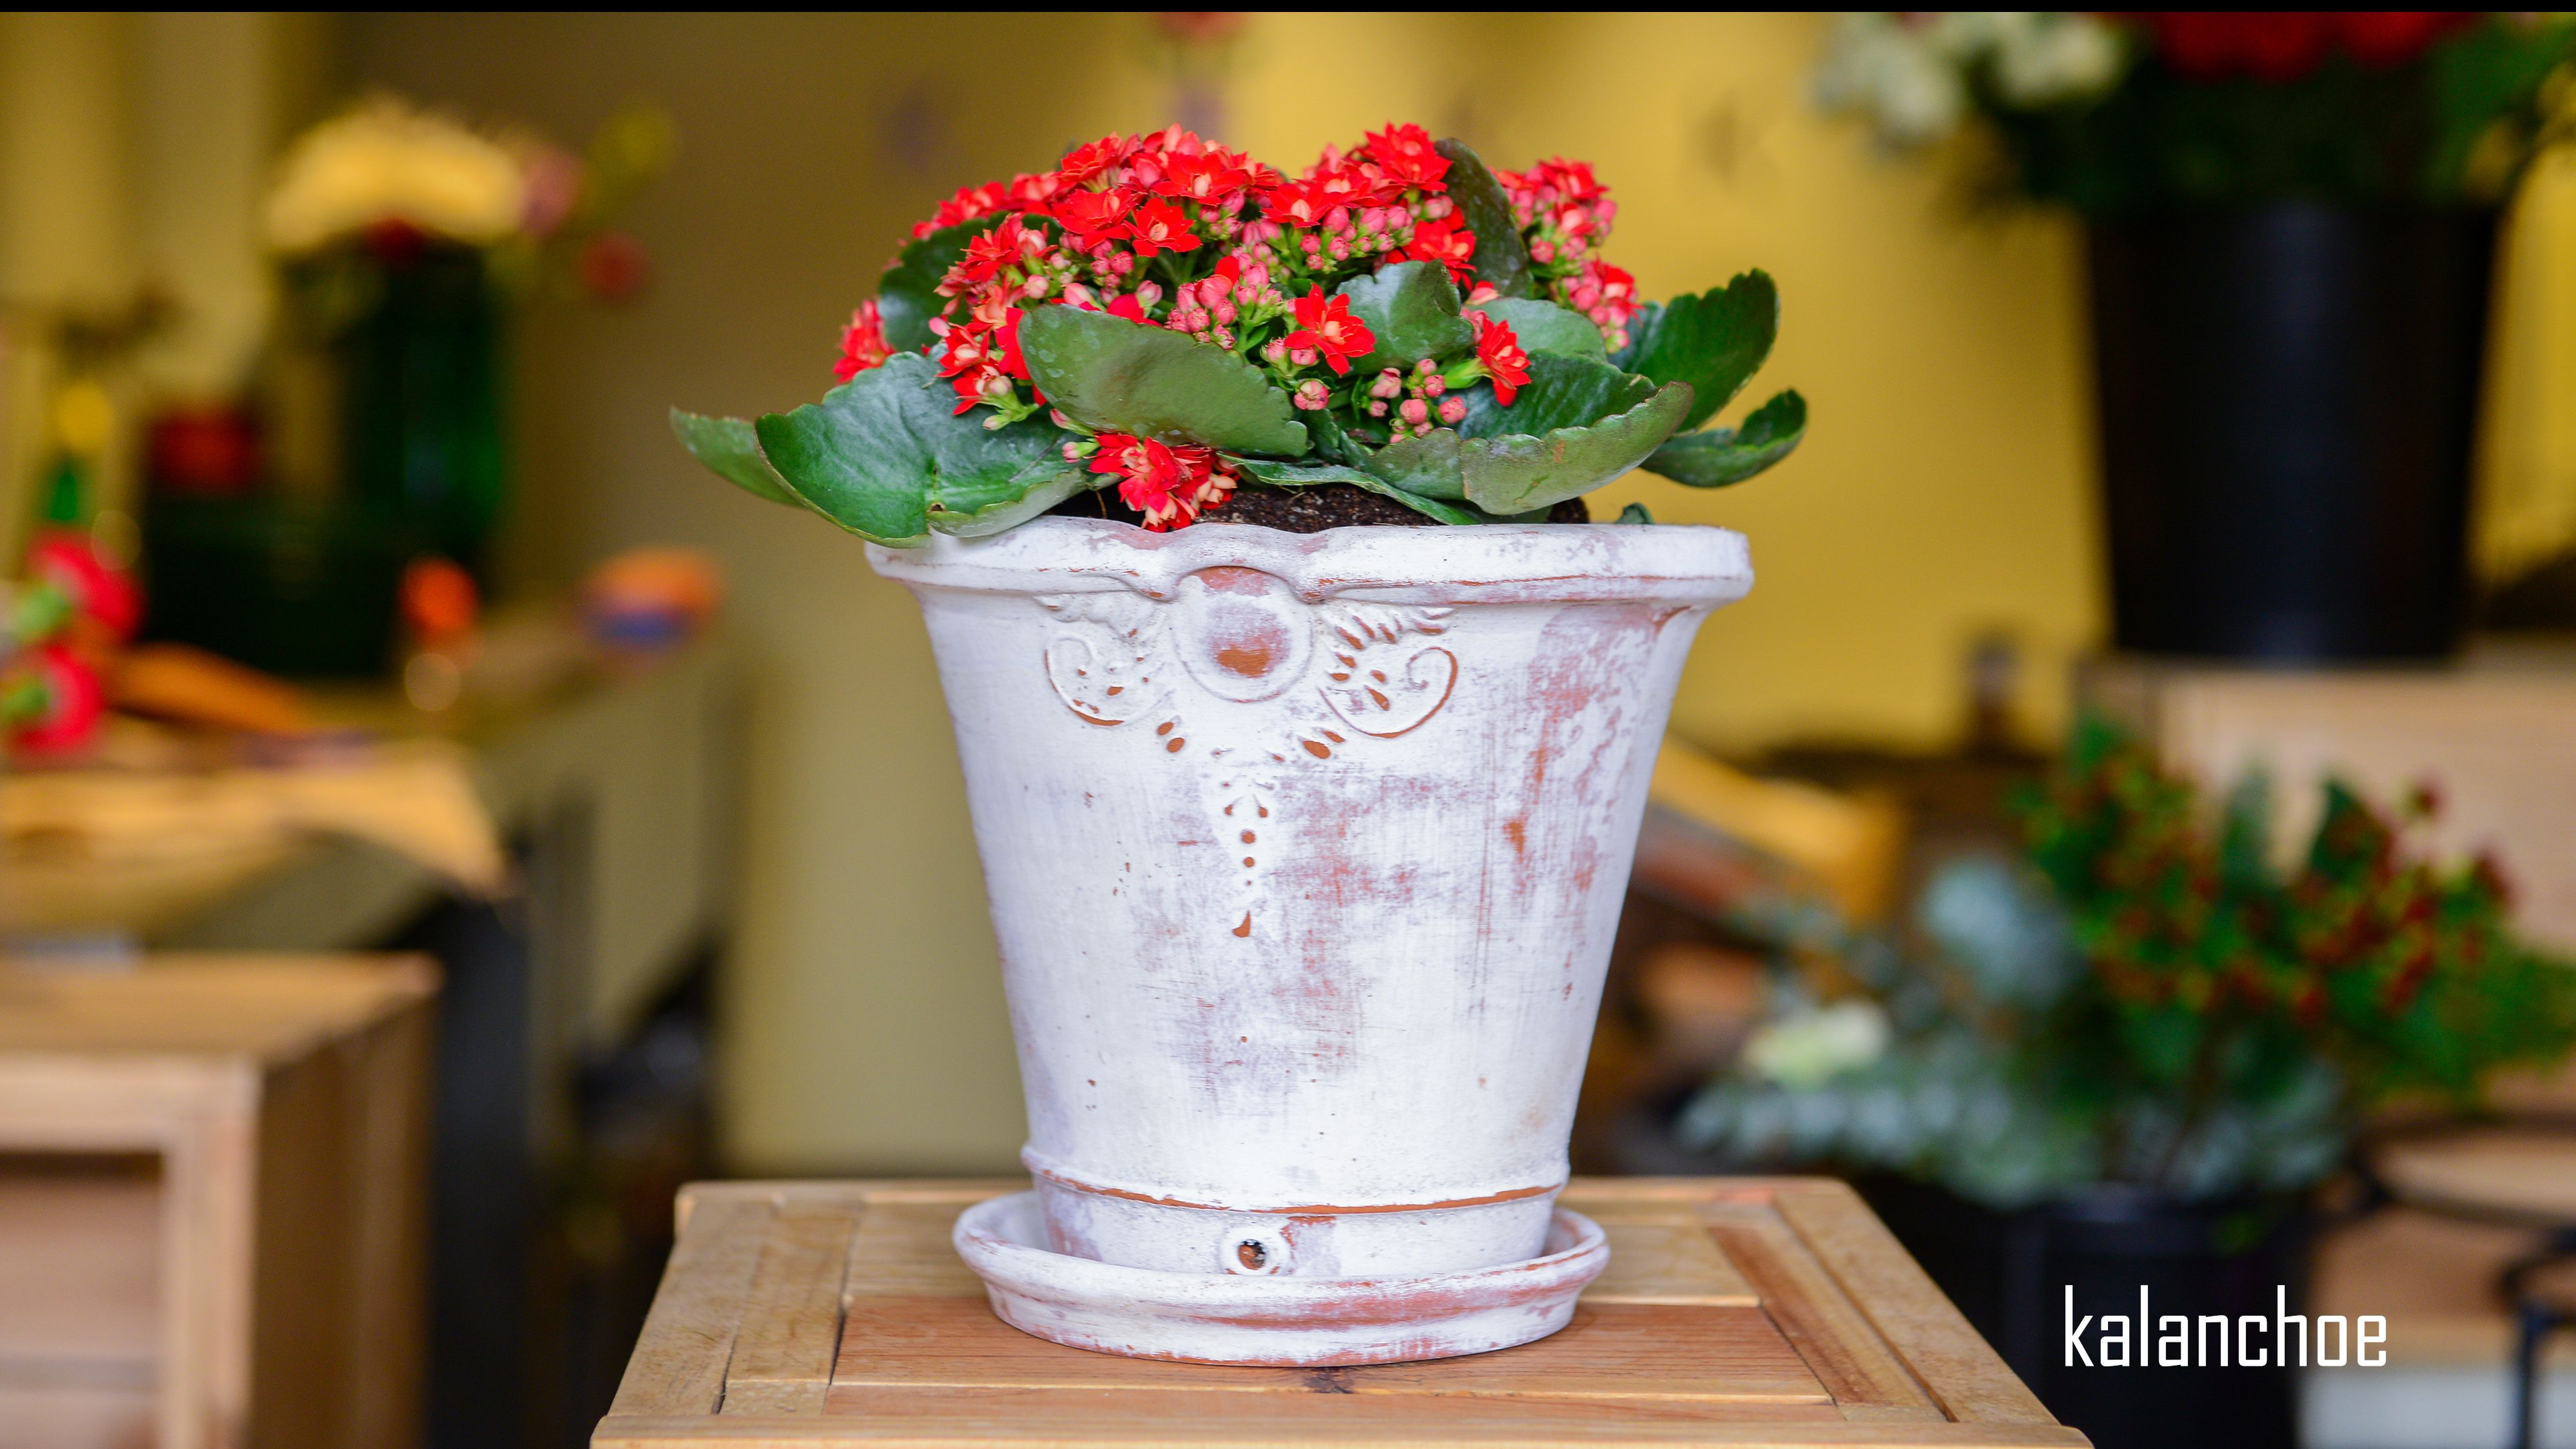 #plantas #macetas #barro #artesanal #mx #floreria #kalanchoe